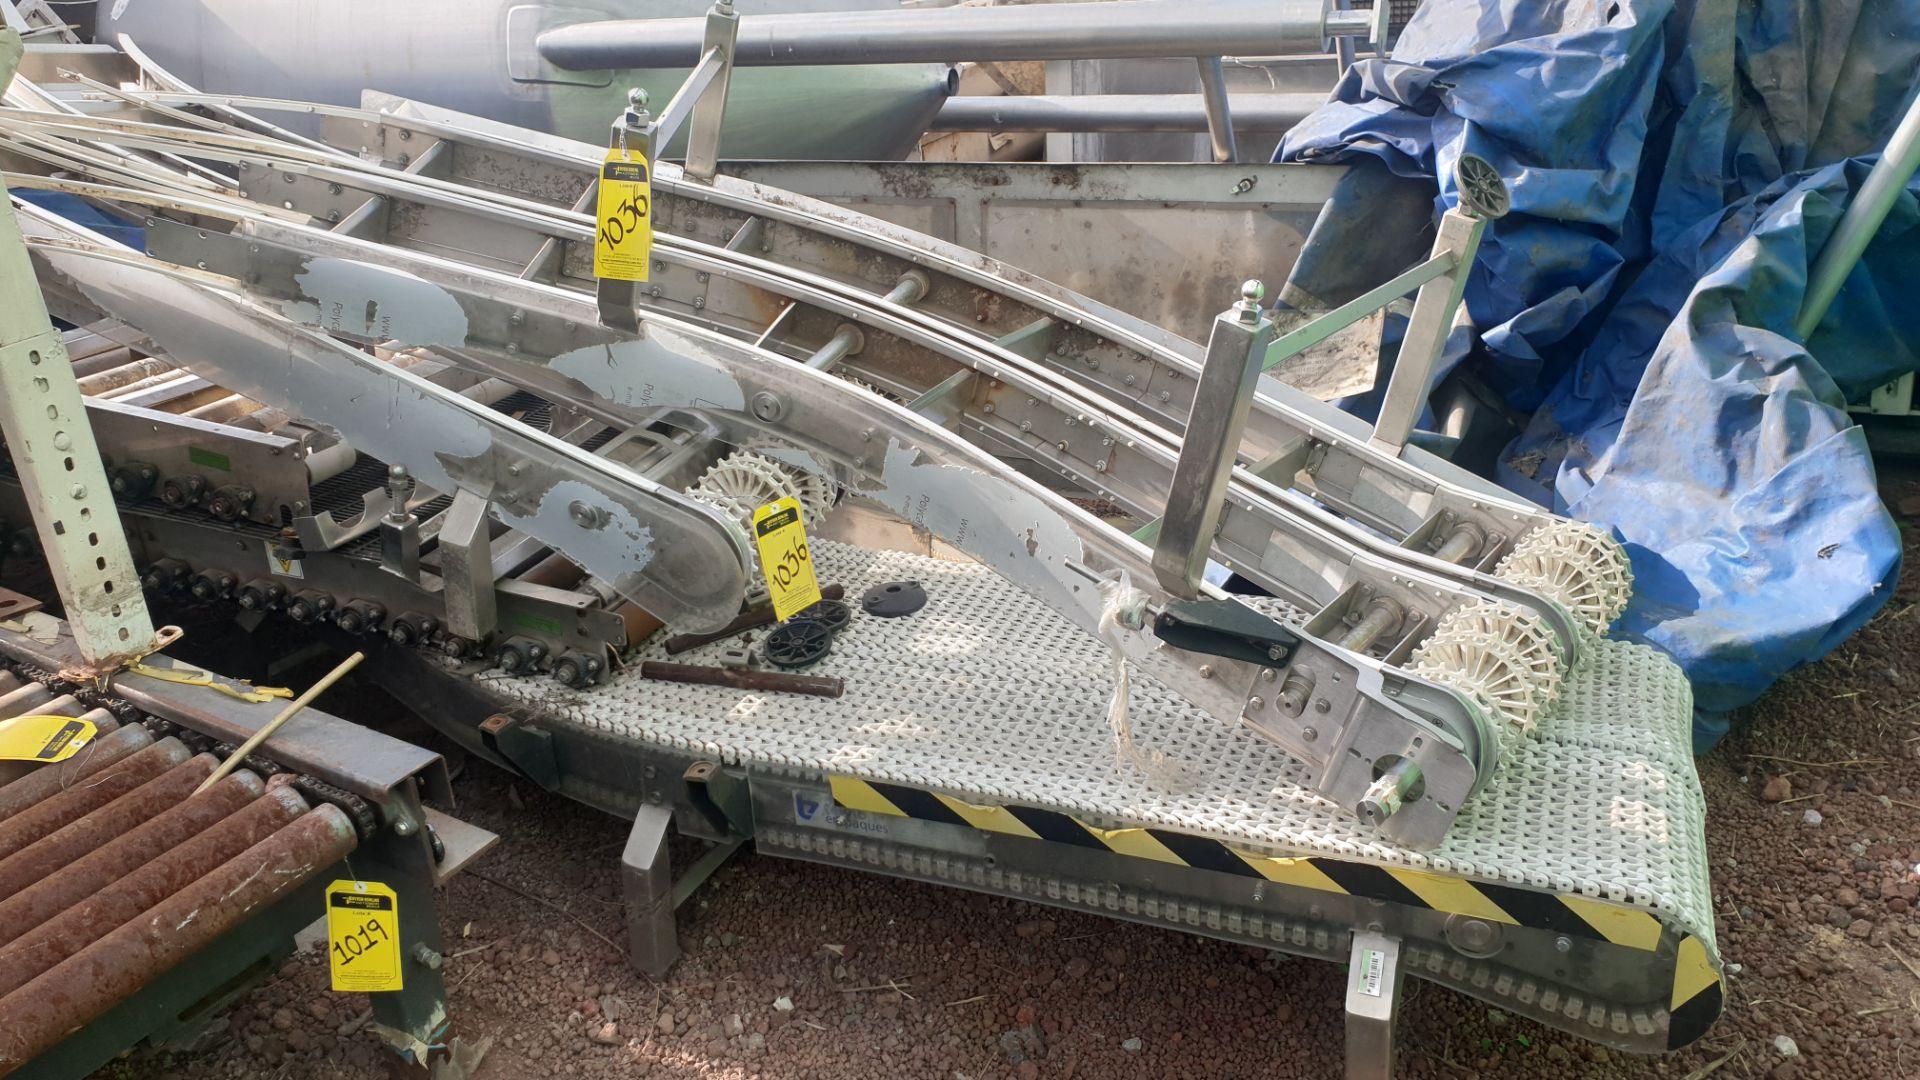 S conveyor belt batch. Please inspect - Image 5 of 9